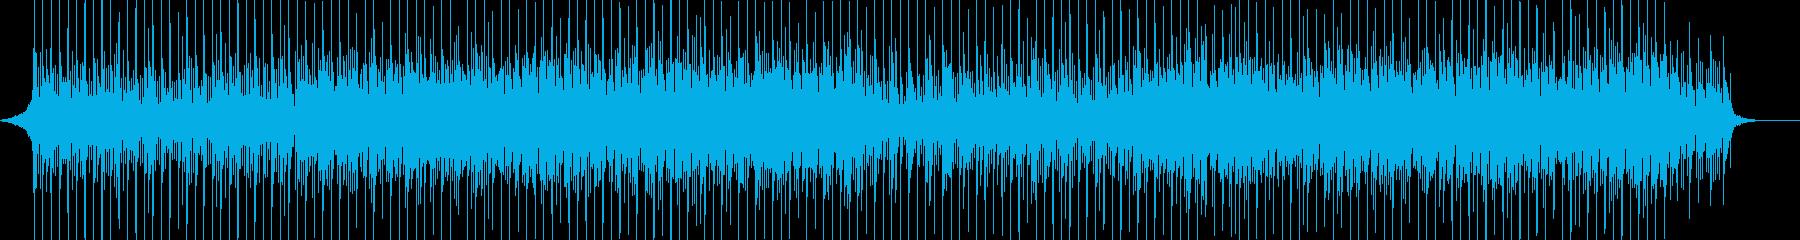 Synth Corporate 66の再生済みの波形